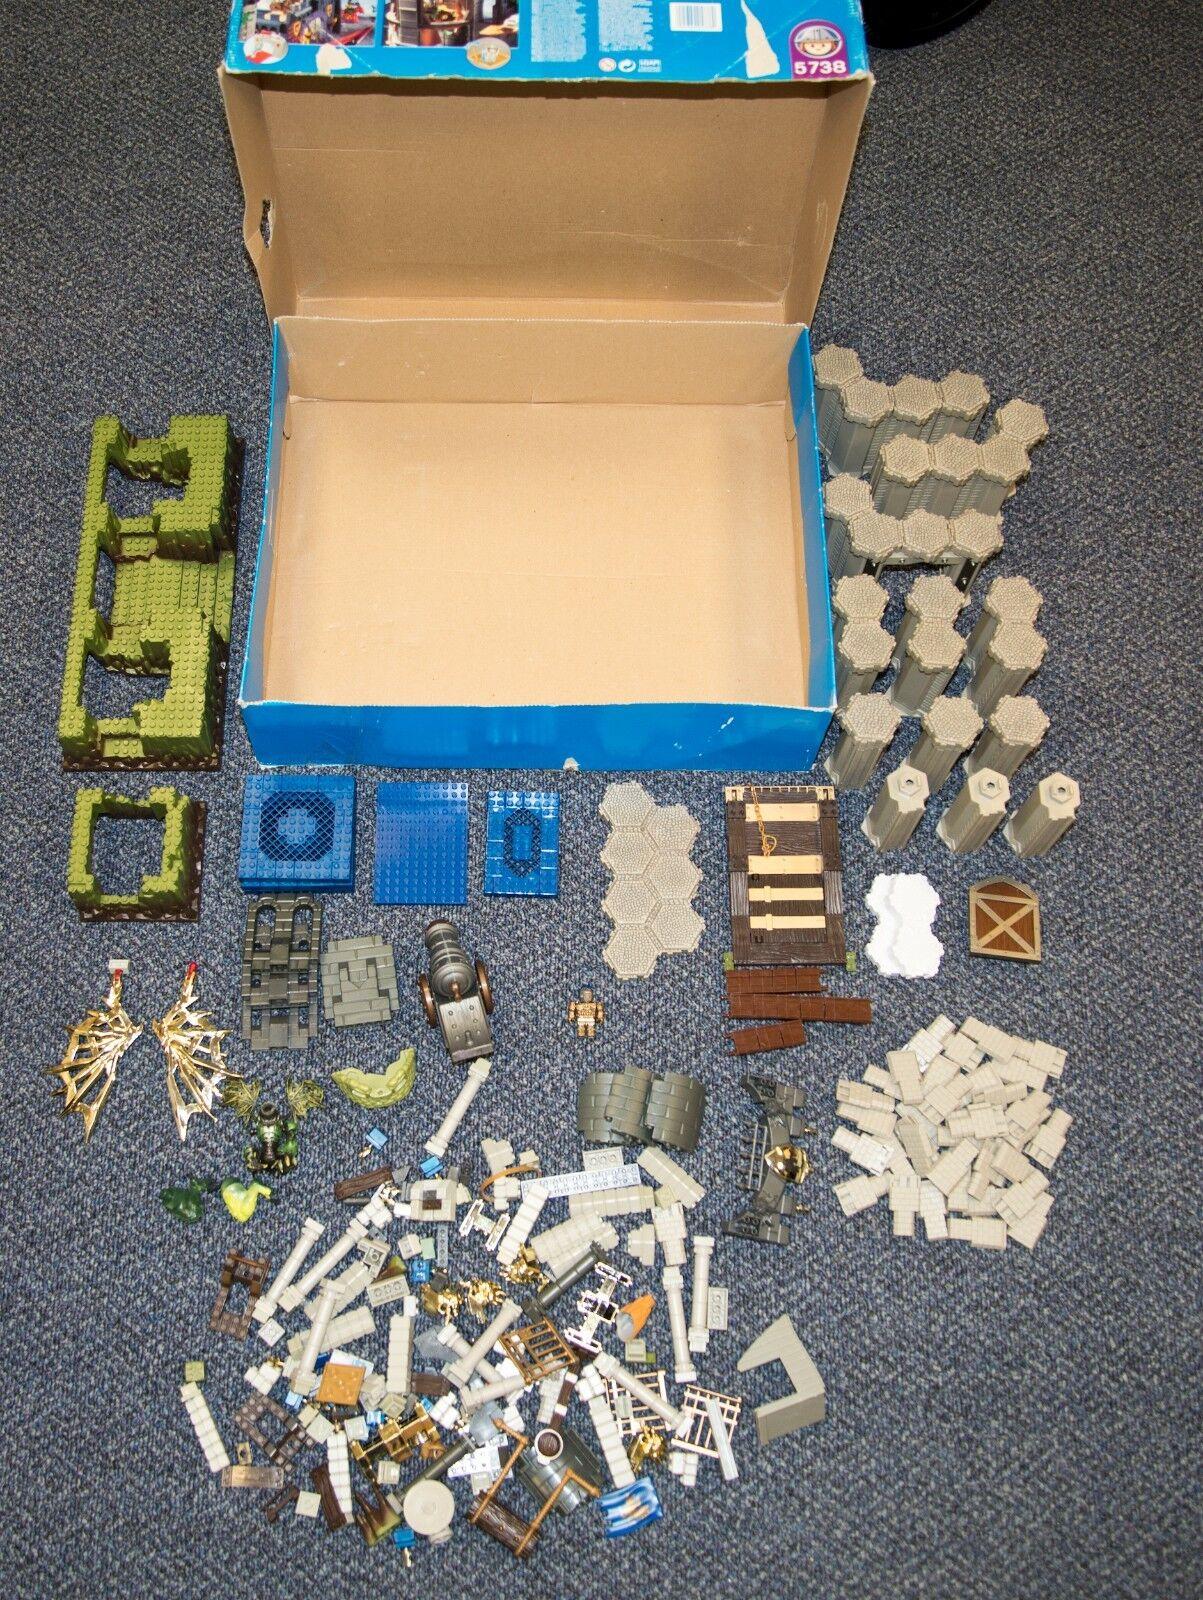 2003 PLAYMOBIL KNIGHTS CATAPULT CASTLE PLAY SET & BOX